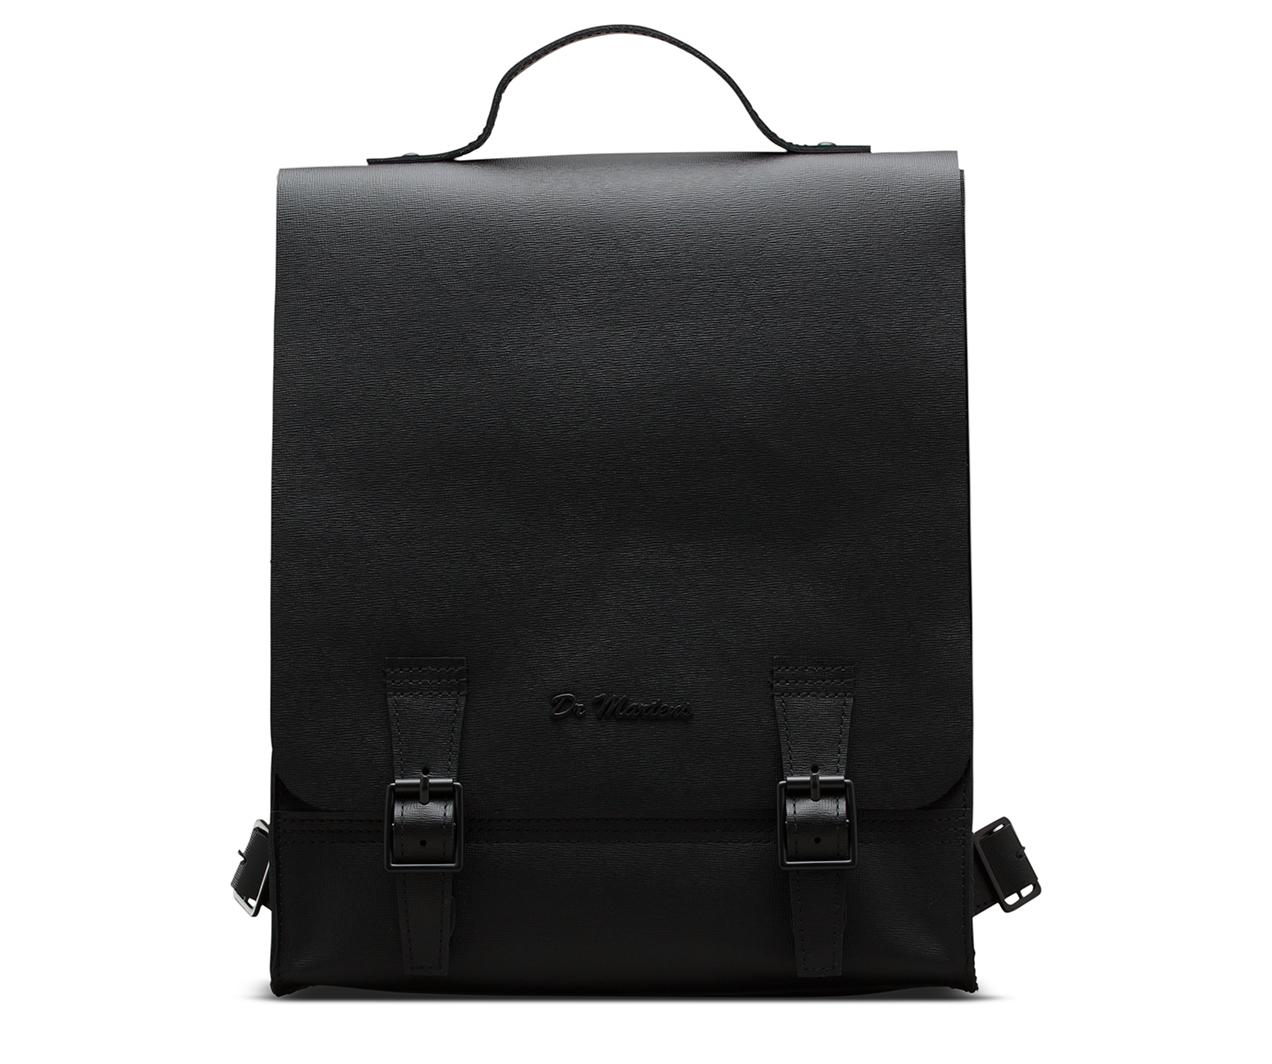 dr martens backpack sale \u003e Clearance shop